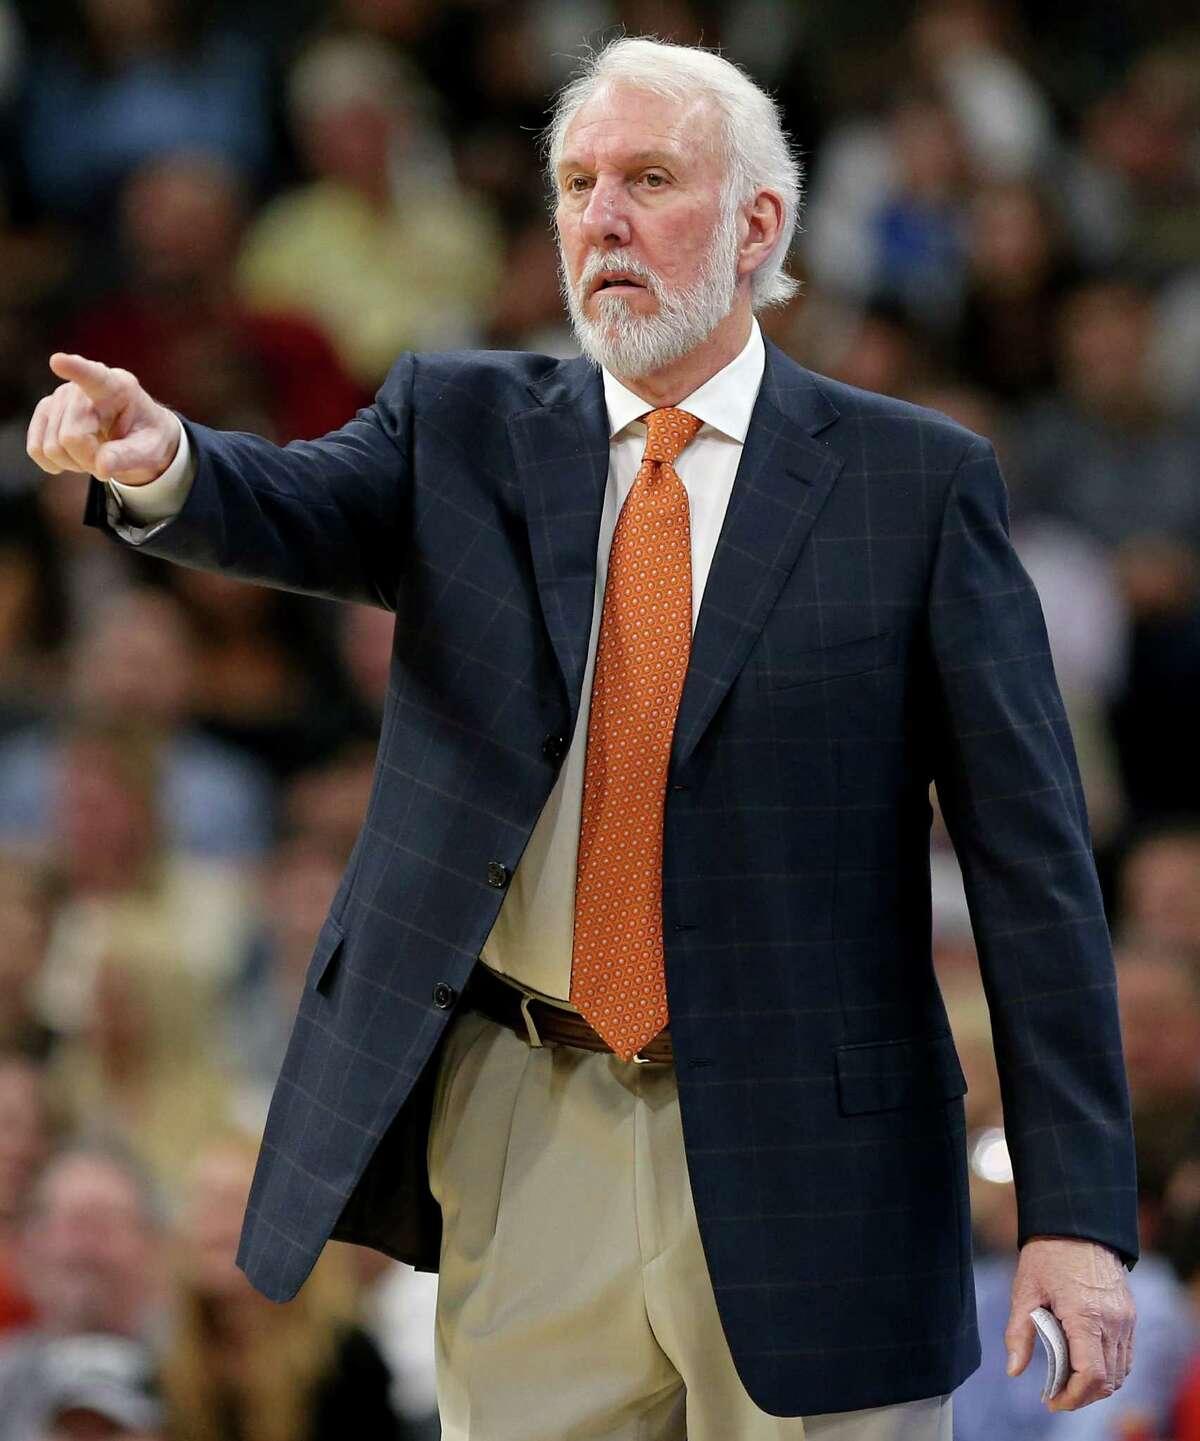 San Antonio Spurs head coach Gregg Popovich received 25 write-in votes.